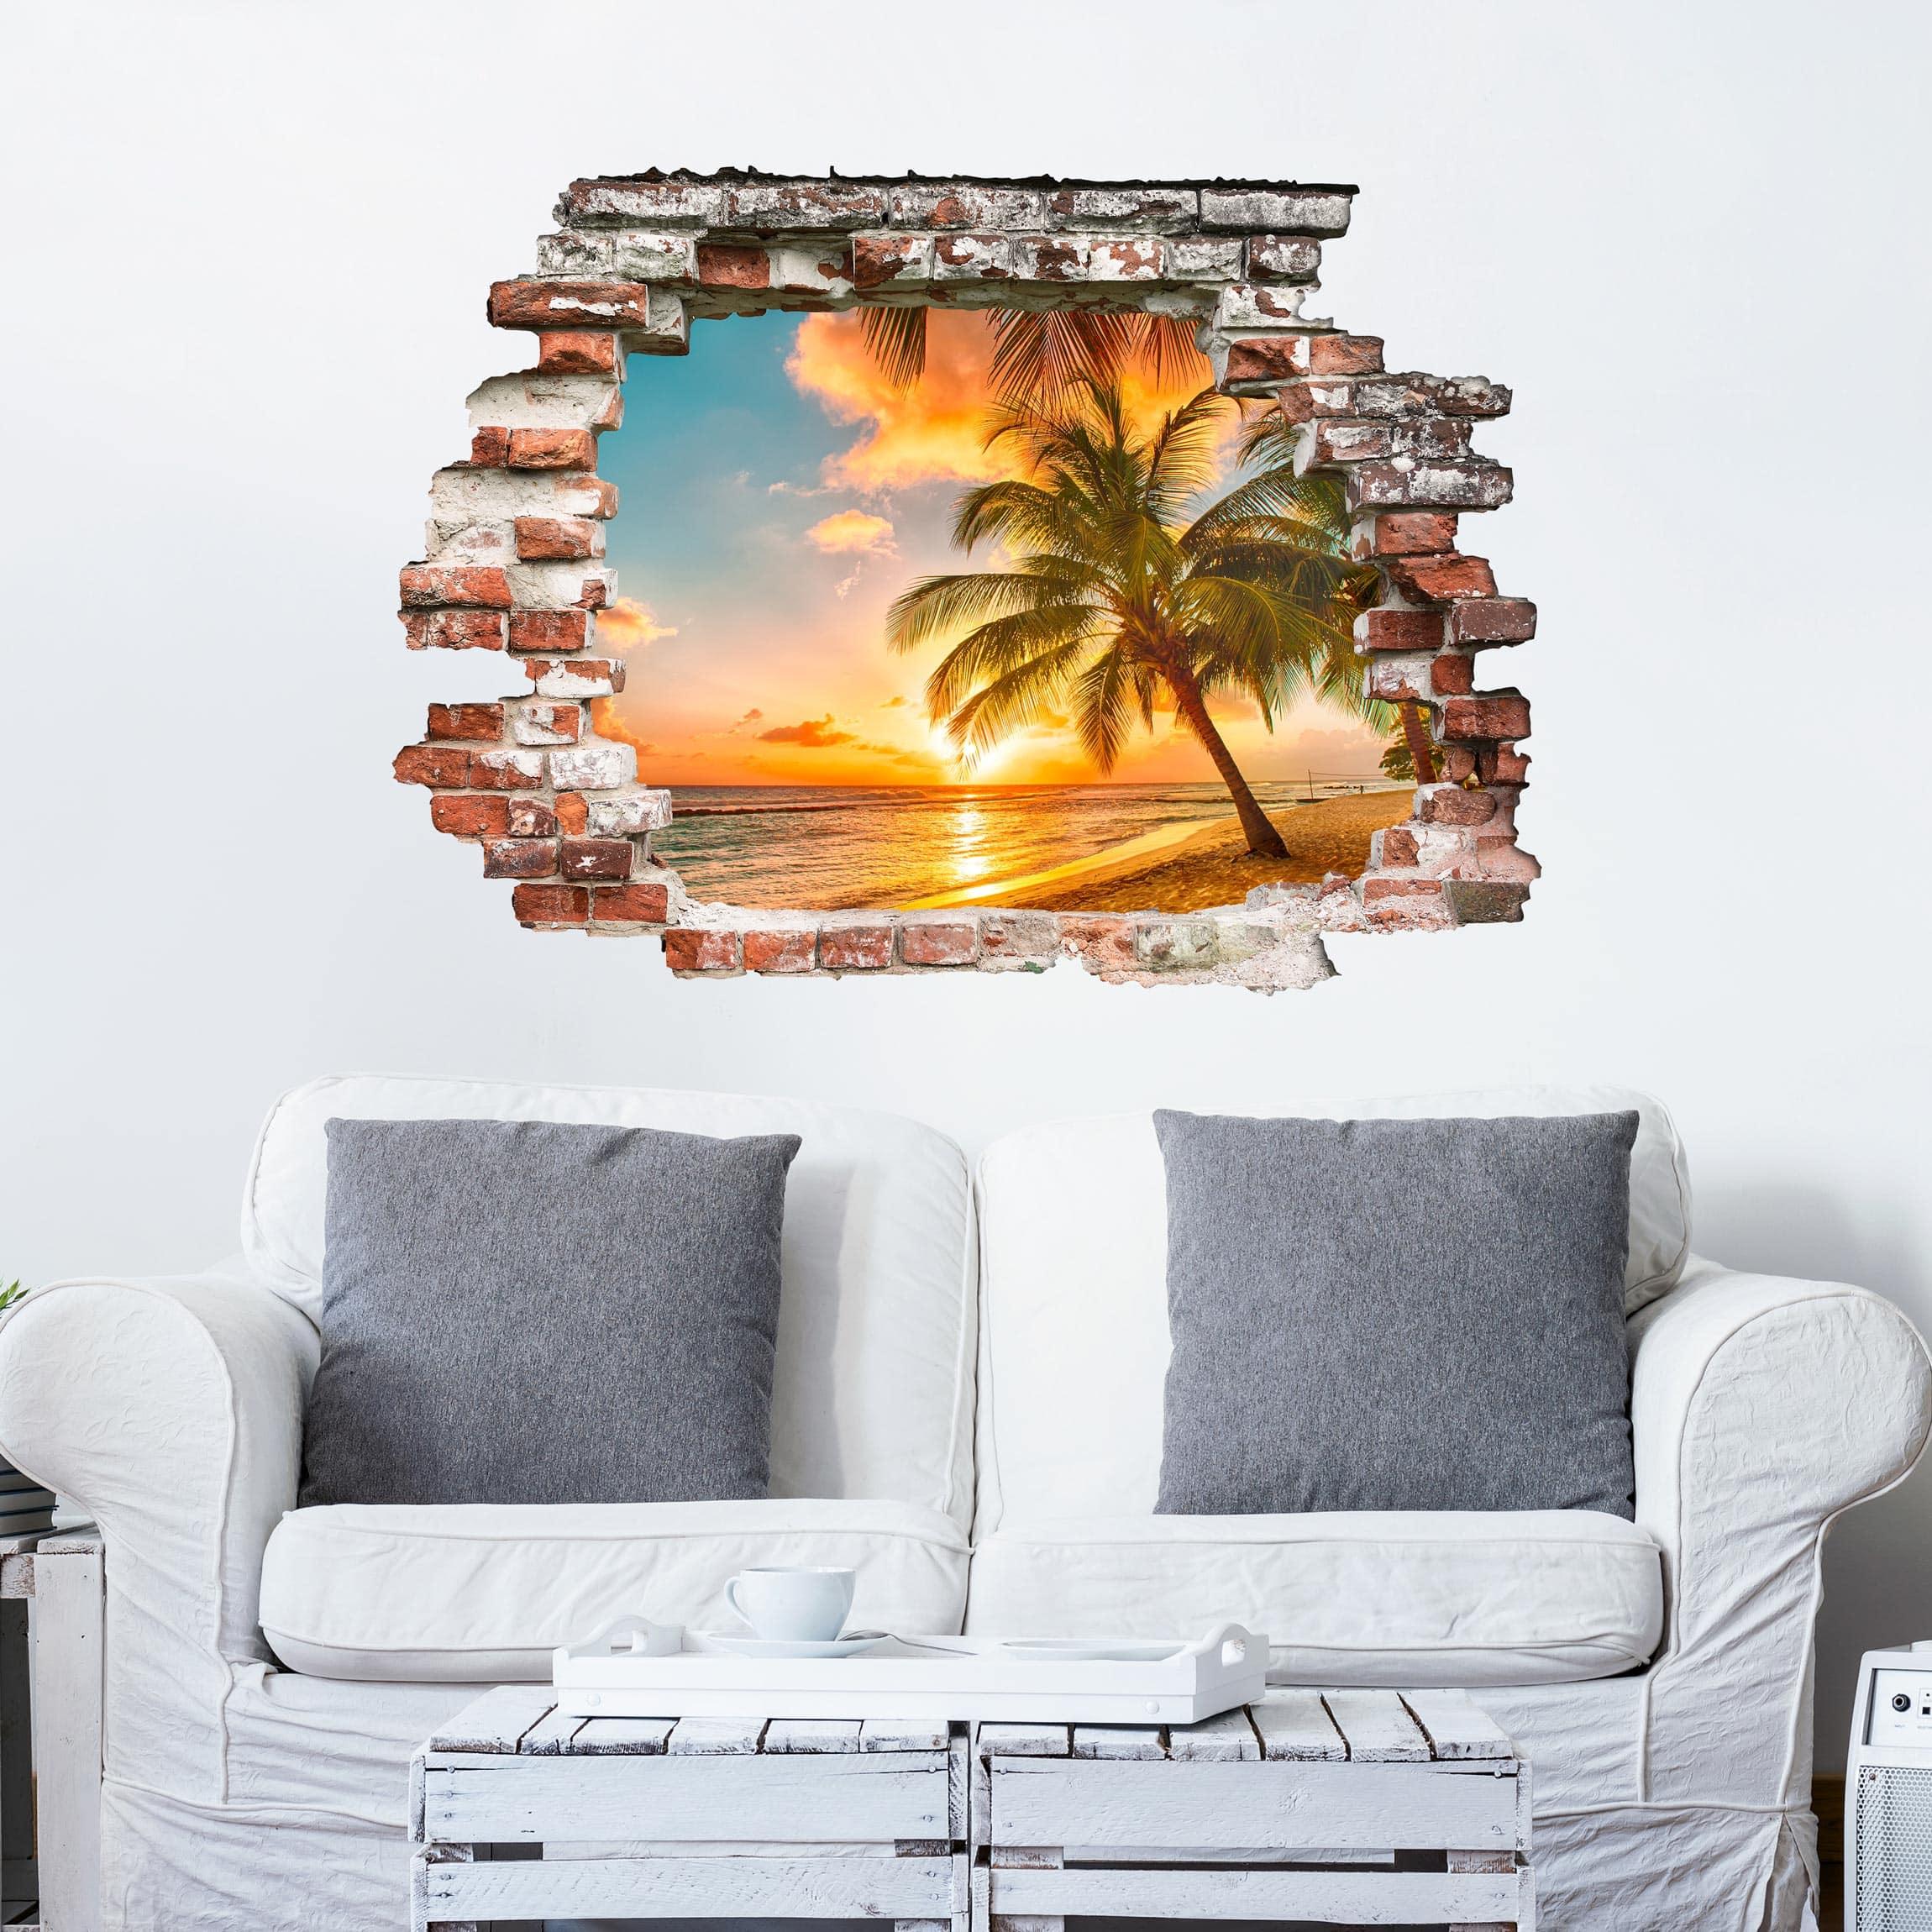 3d wandtattoo sonnenaufgang am strand. Black Bedroom Furniture Sets. Home Design Ideas